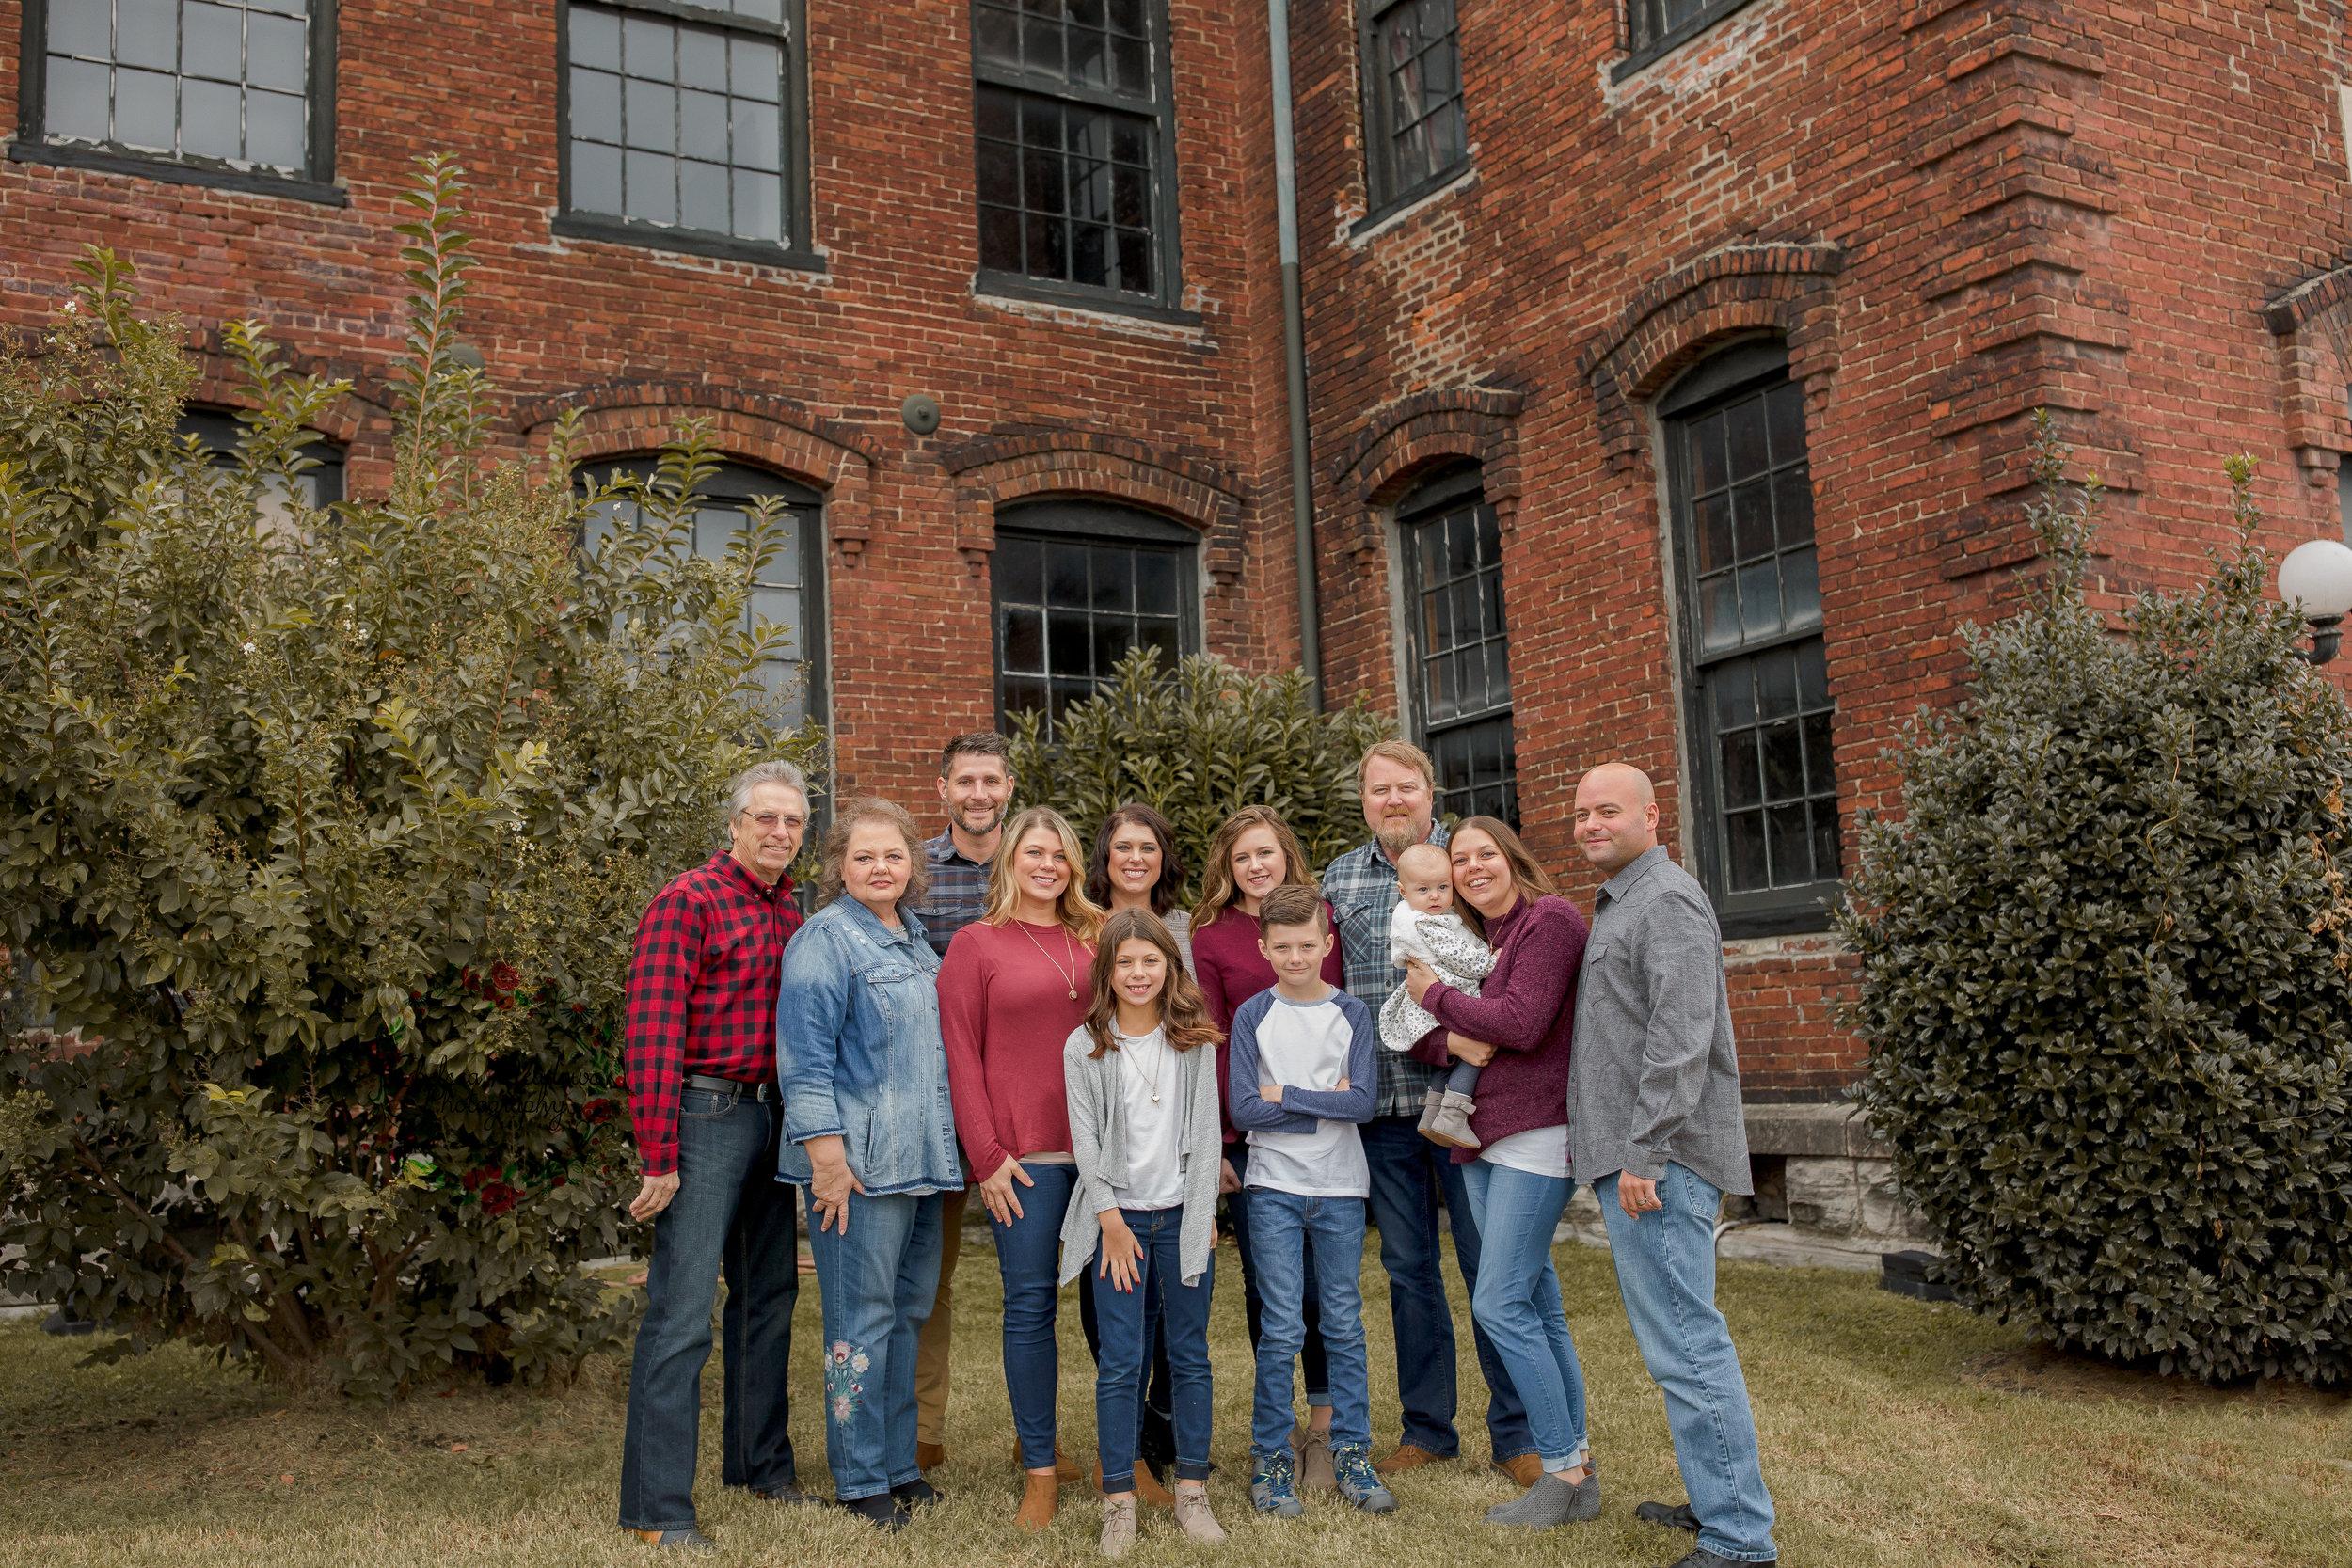 Shannon Family Session - Nashville Family Photographer - Chelsea Meadows Photography (107).jpg